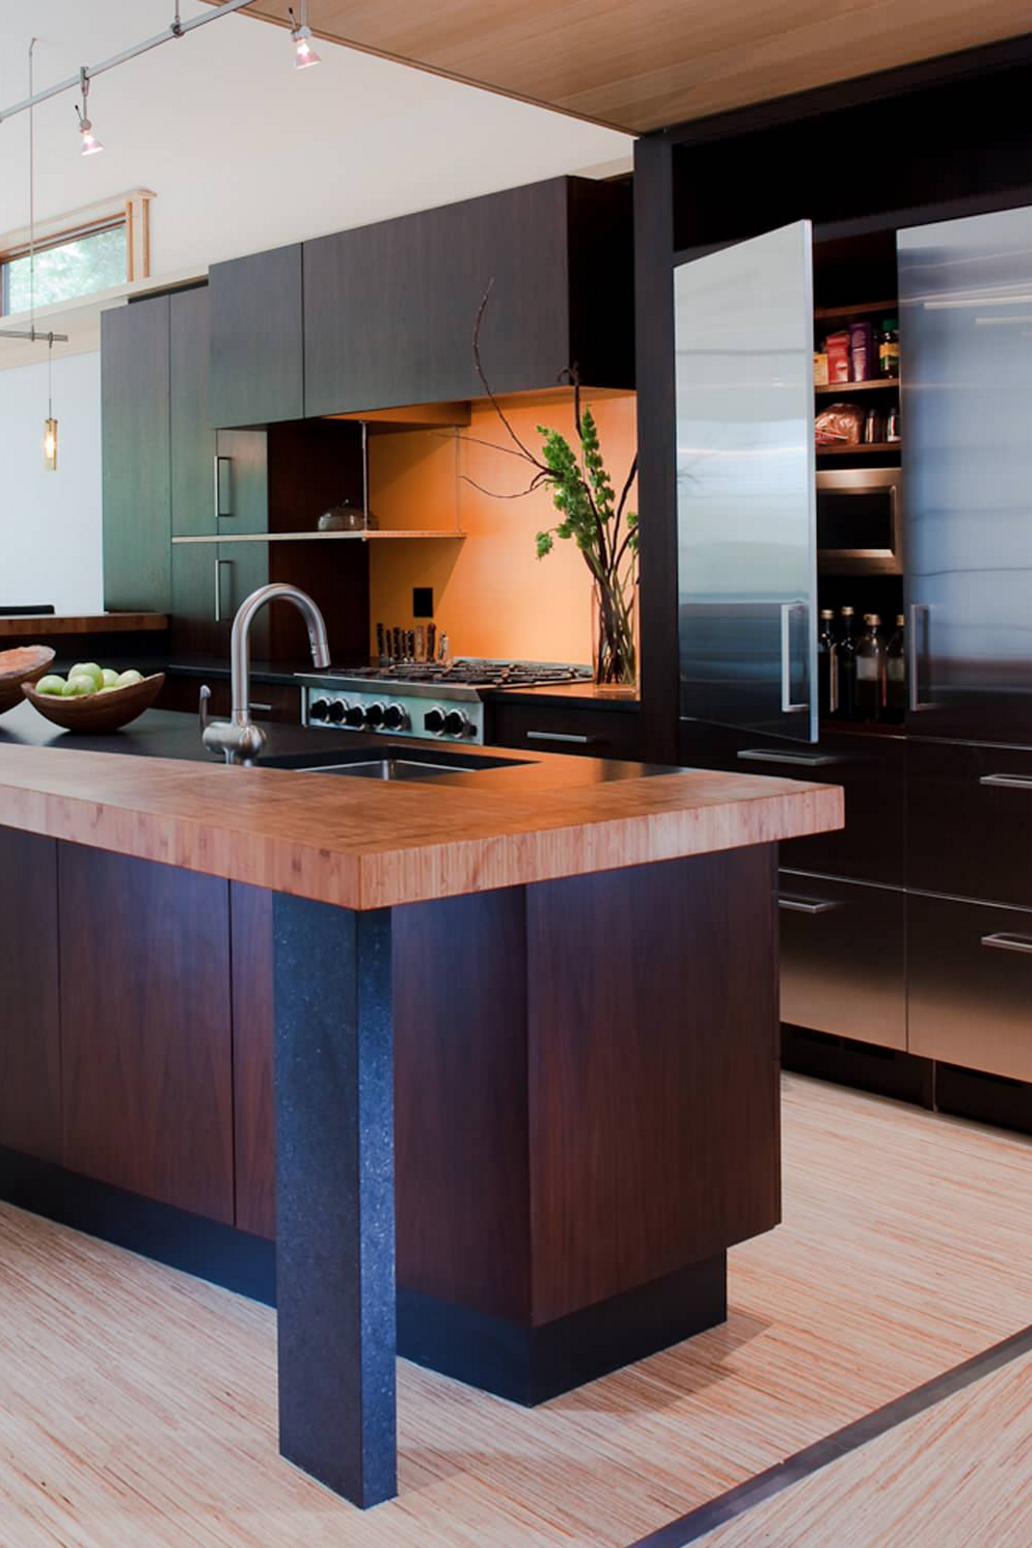 pin by jaye cairo on kitchens modern kitchen design on awesome modern kitchen design ideas id=38171